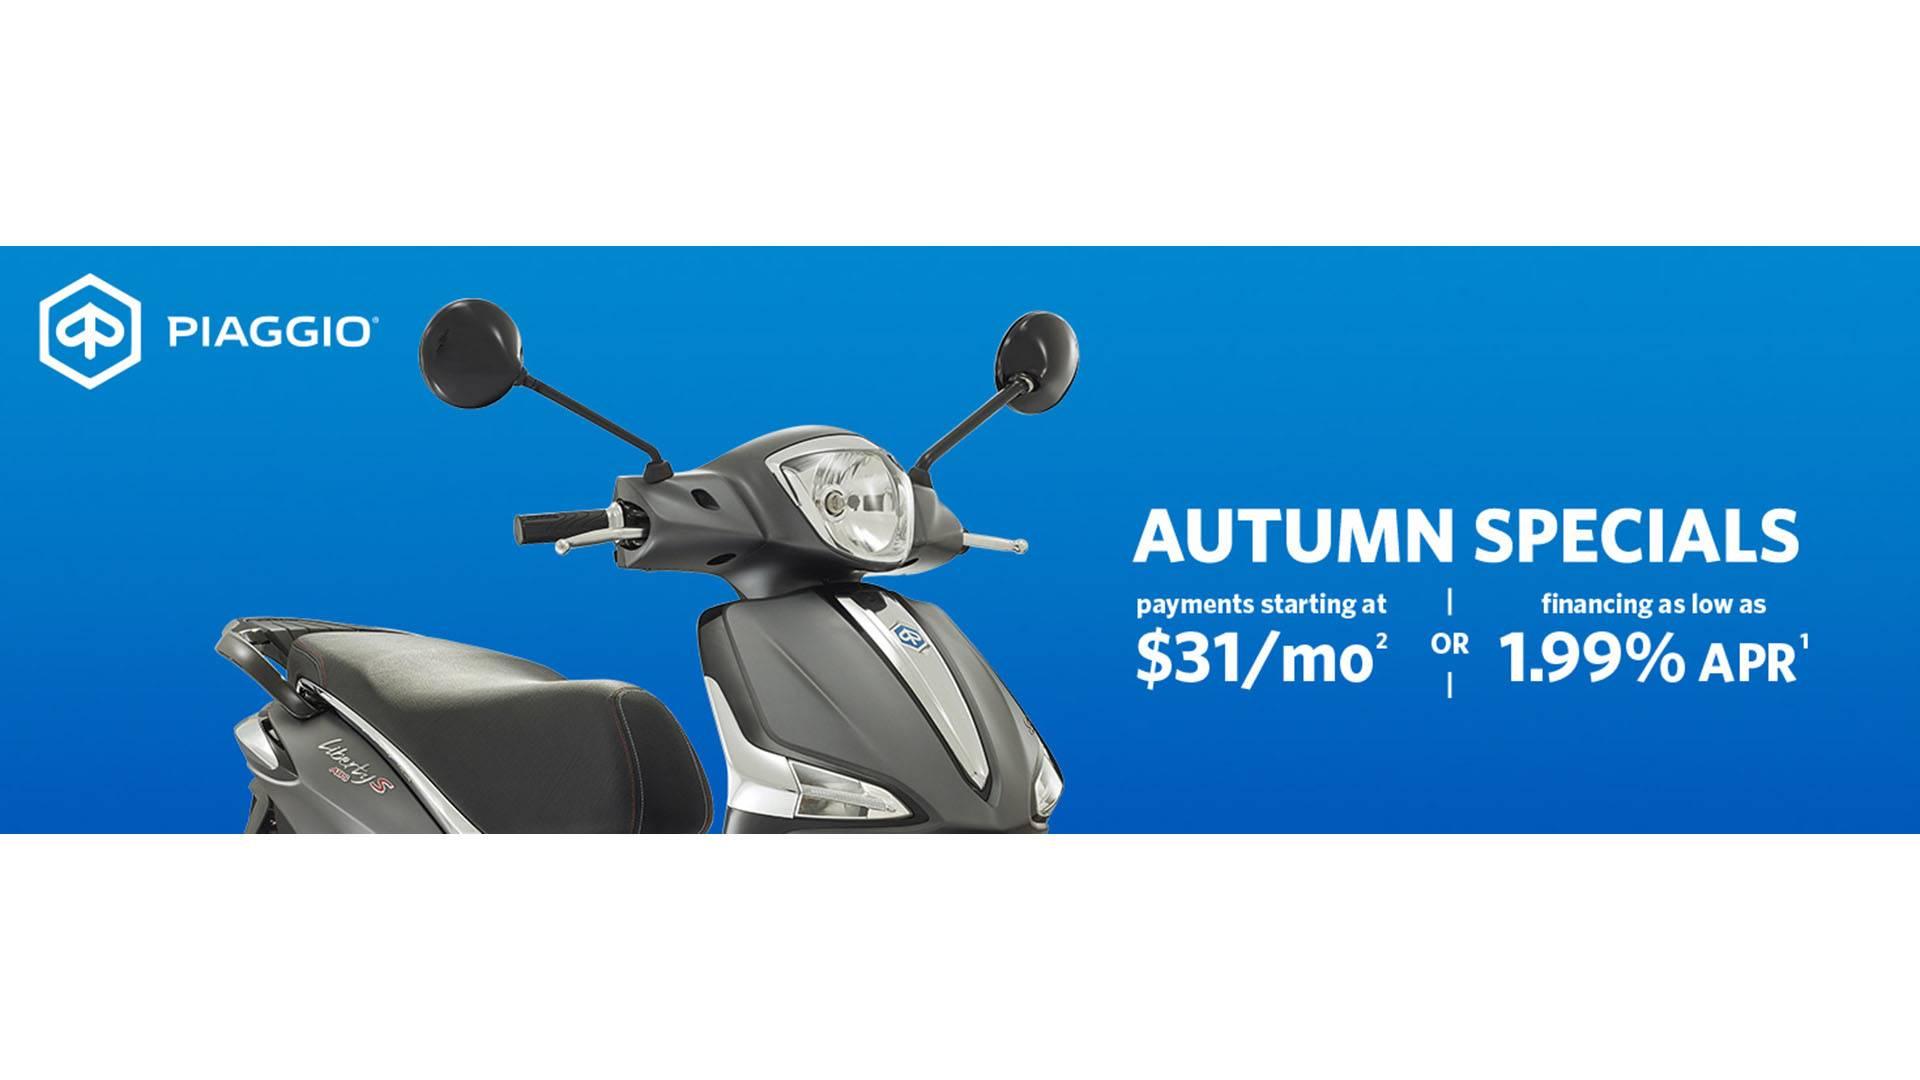 Piaggio Autumn Specials